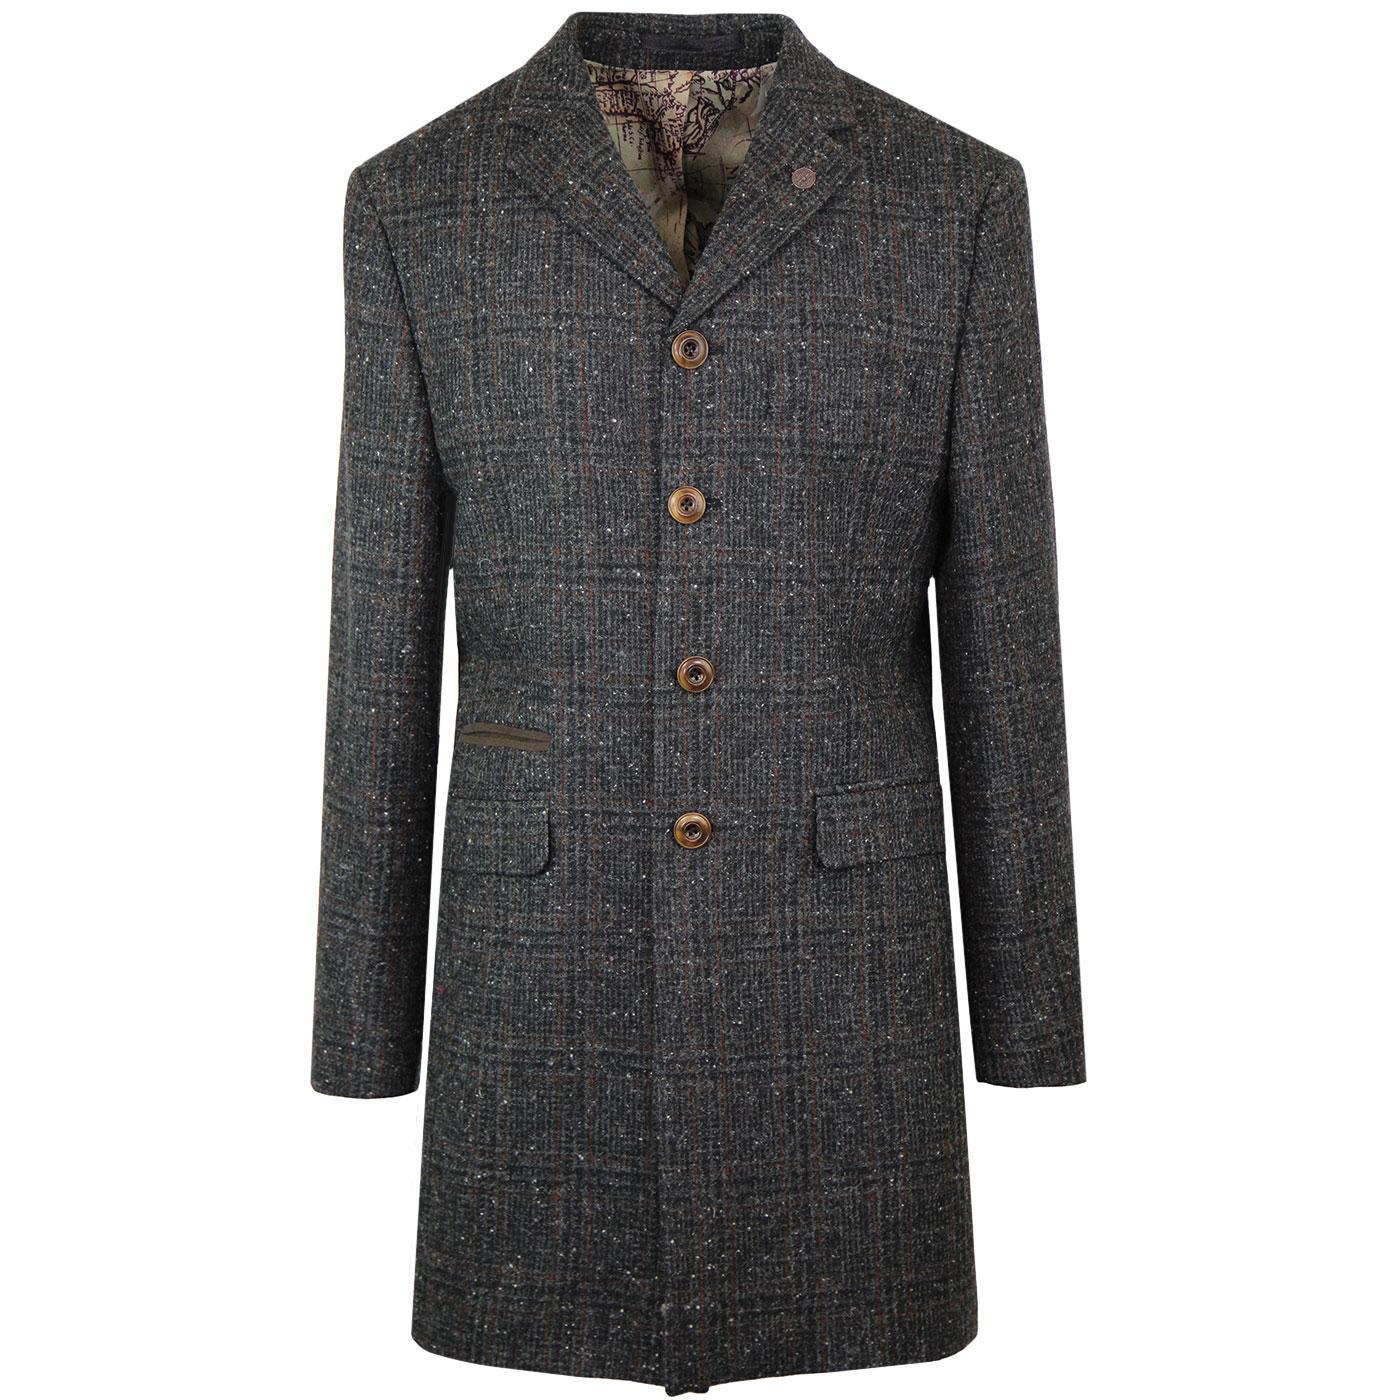 Winnie GIBSON LONDON 60s Mod Glen Check Dress Coat